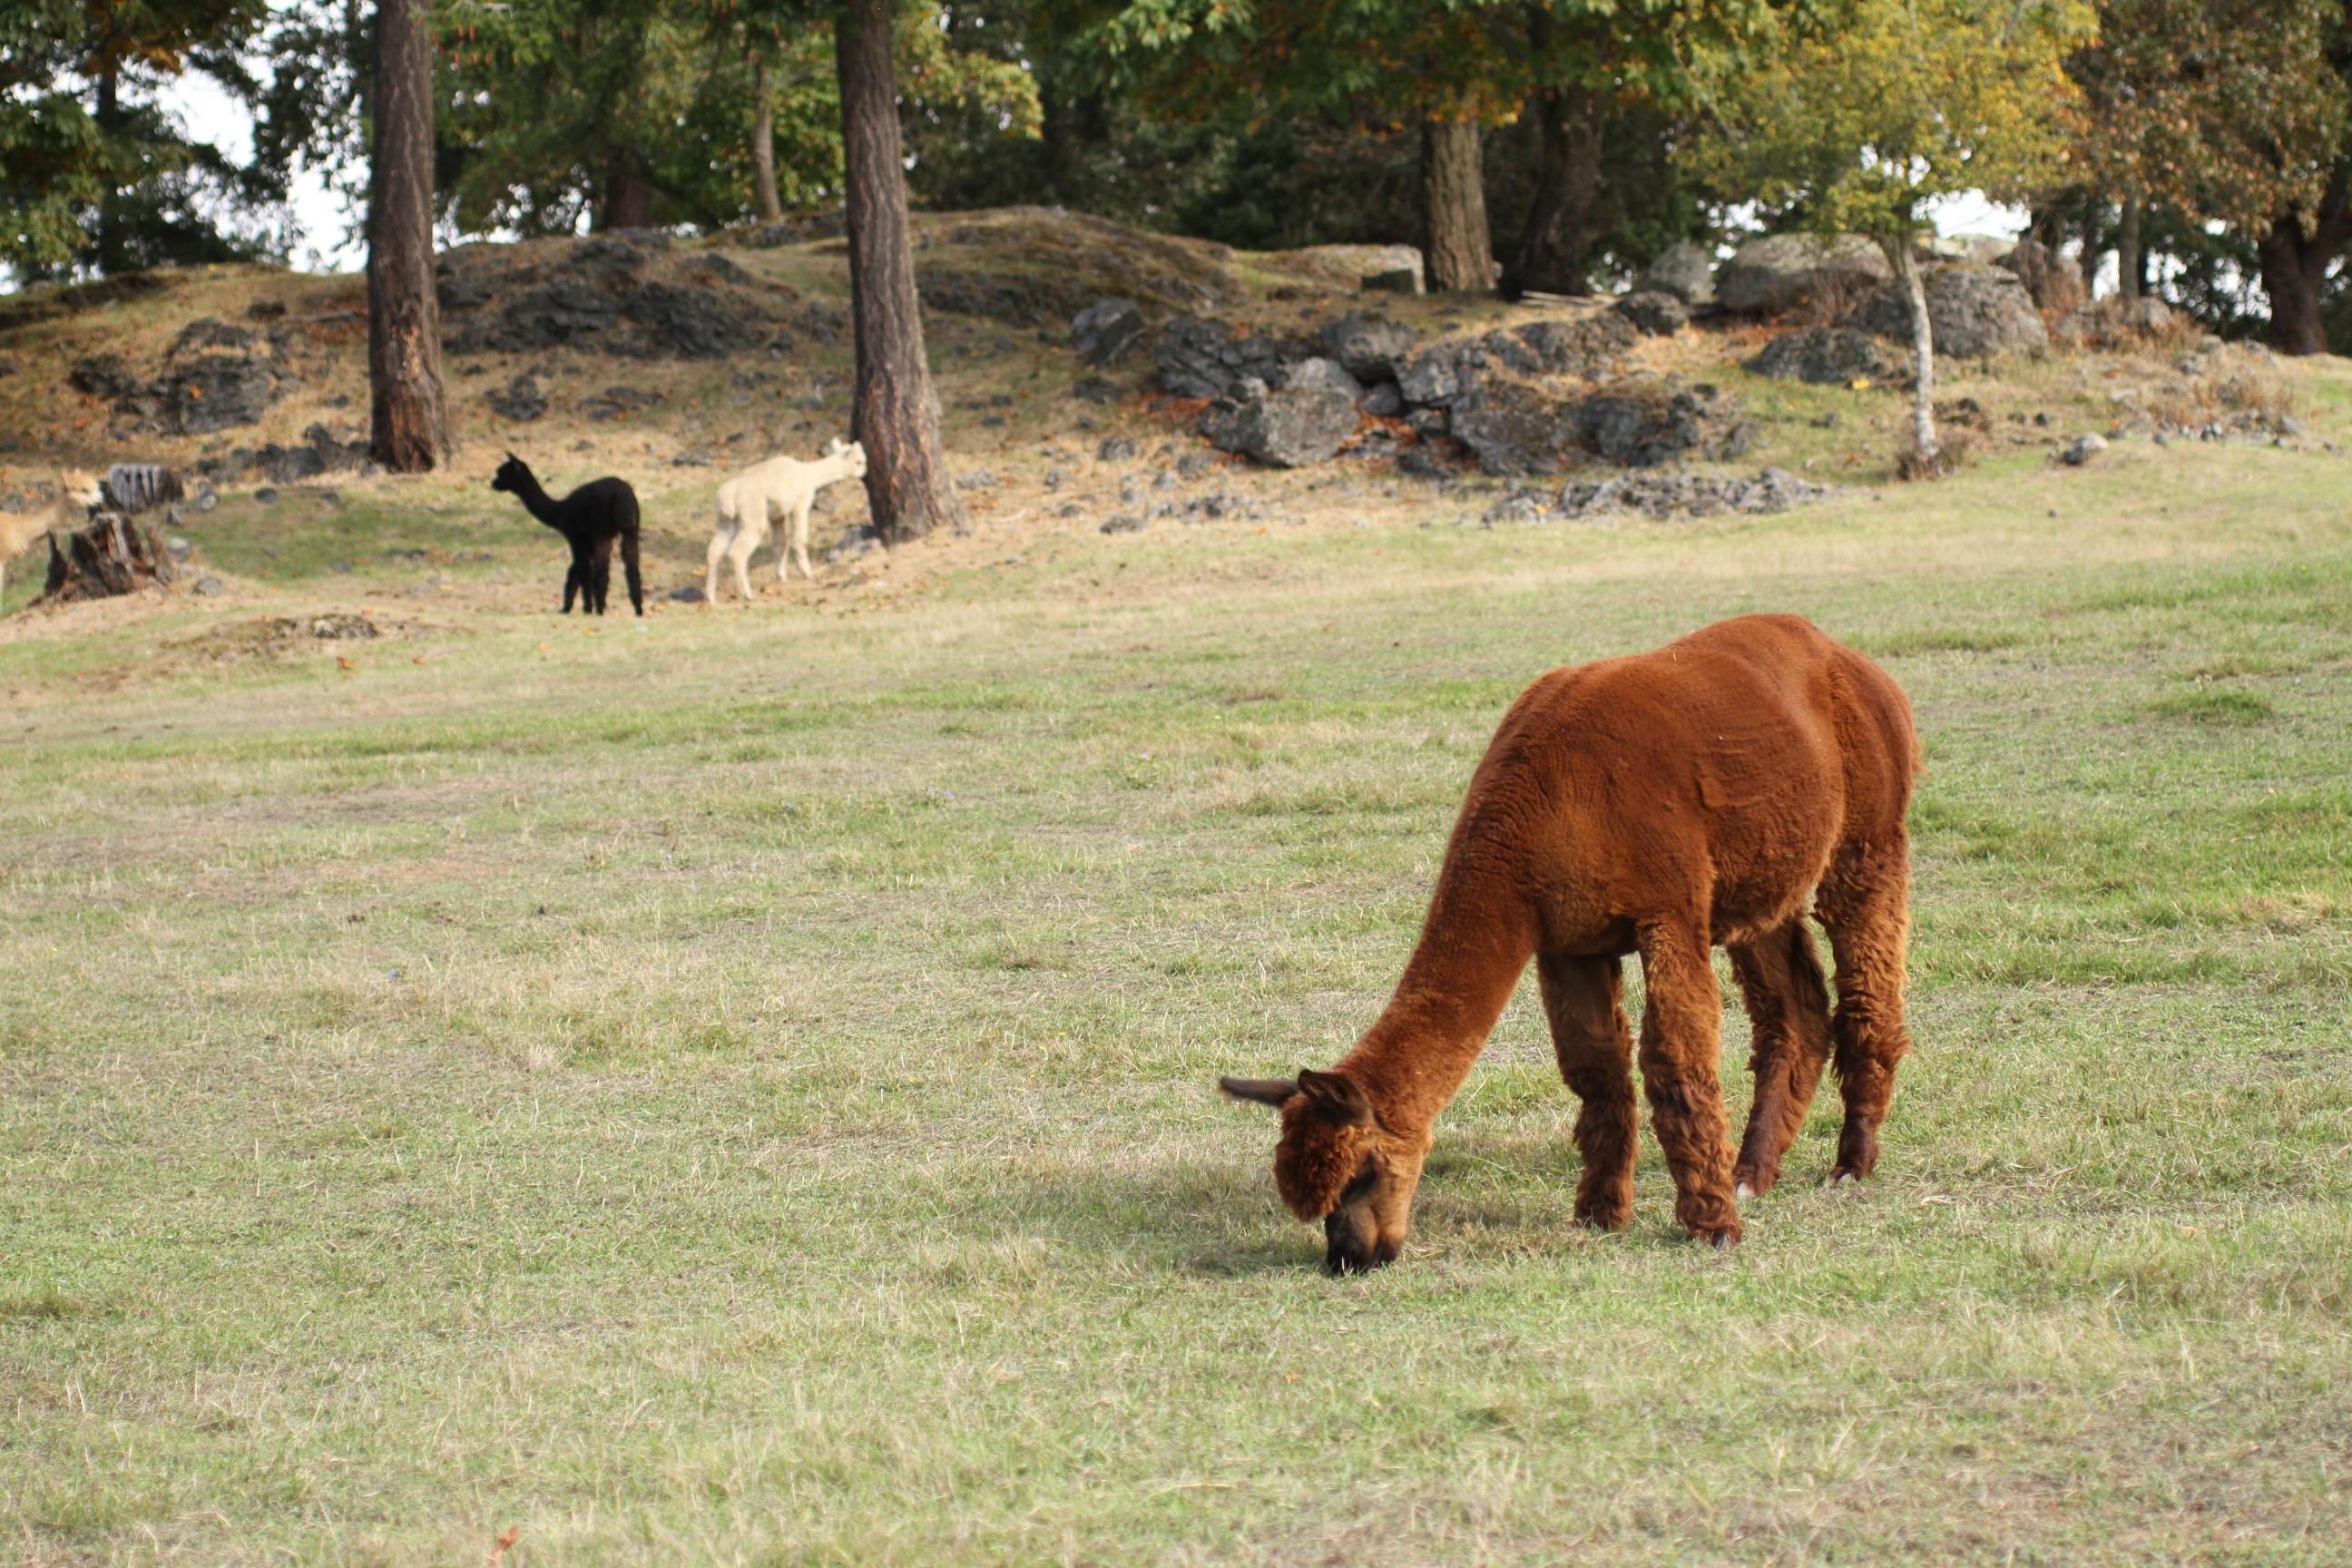 Alpacas at the Krystal Acres Alpaca Farm